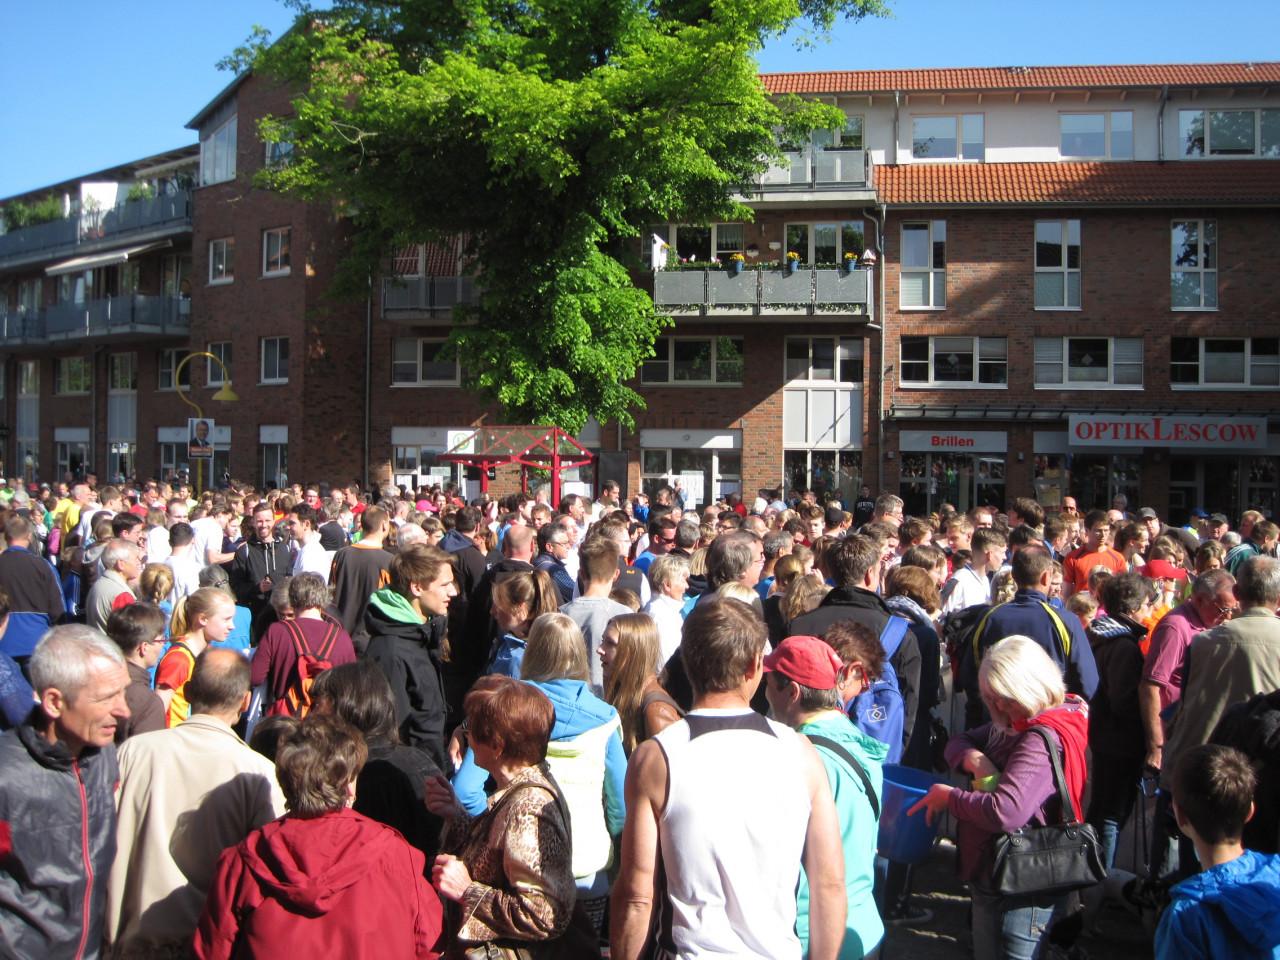 Stadtlauf Kaltenkirchen, 01.05.2014